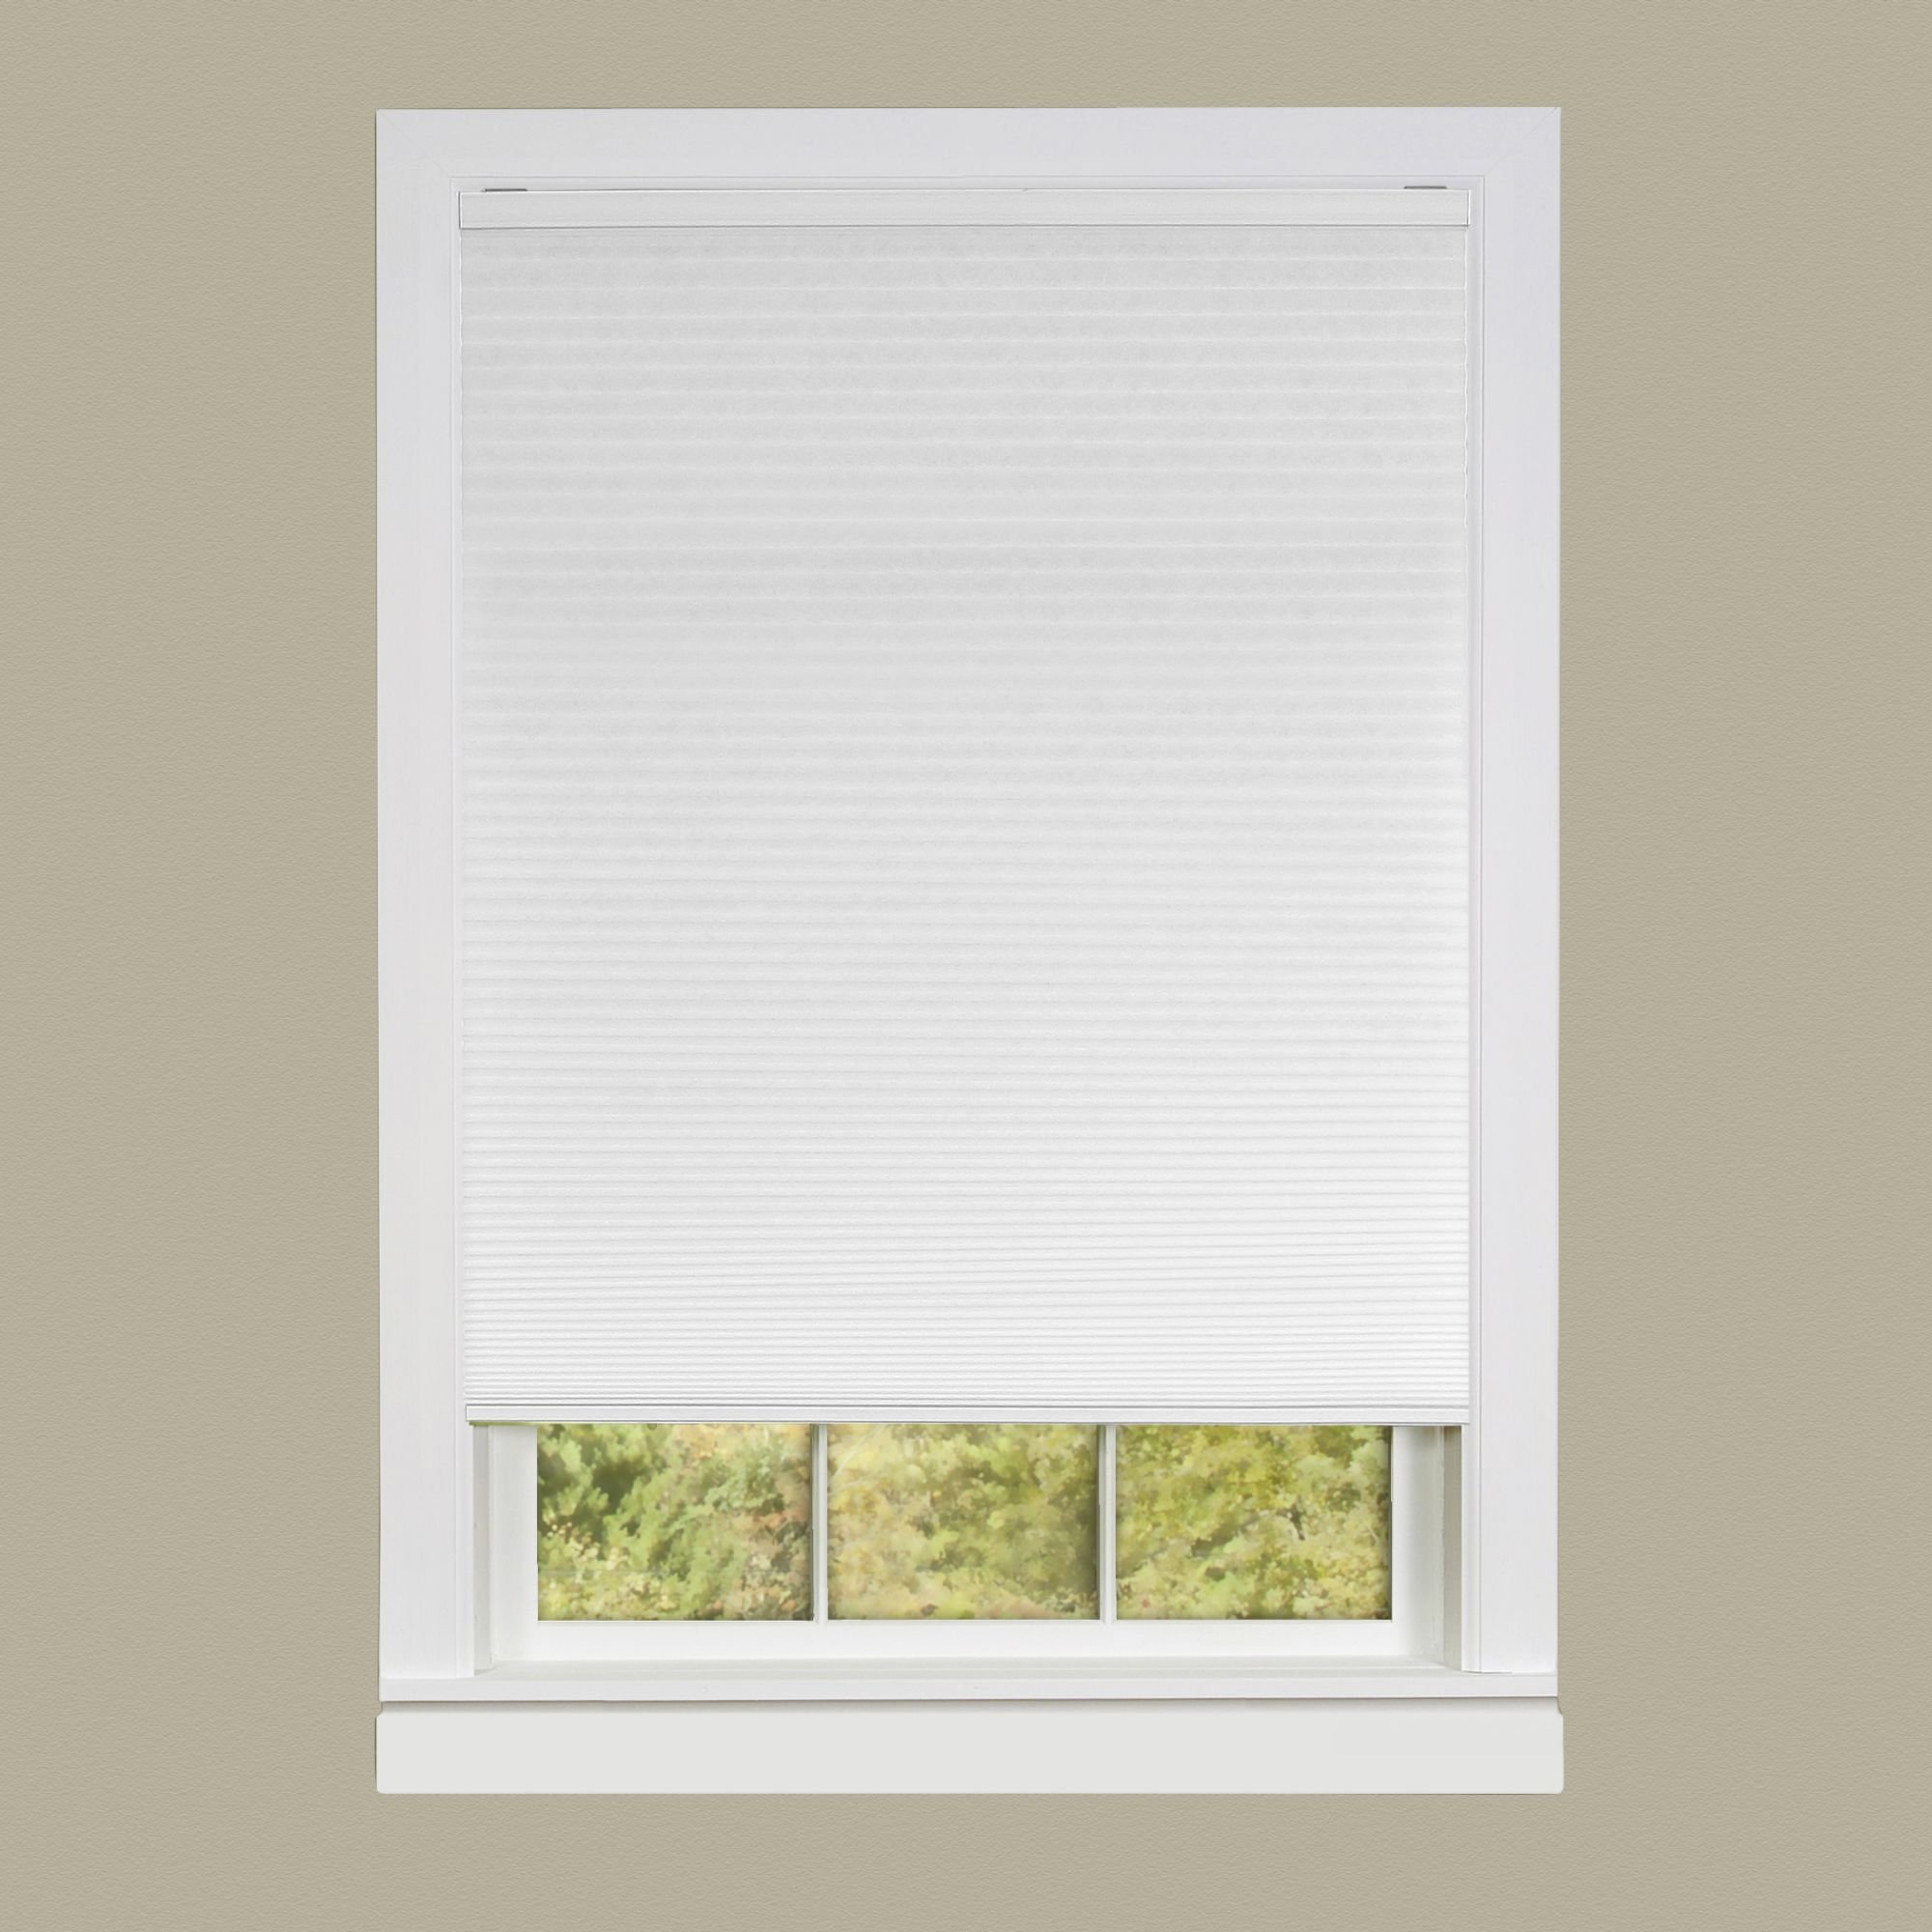 Achim Home Furnishings Cordless Honeycomb Cellular Pleated Window Shade, 45'' X 64'', White, 45 X 64 by Achim Home Furnishings